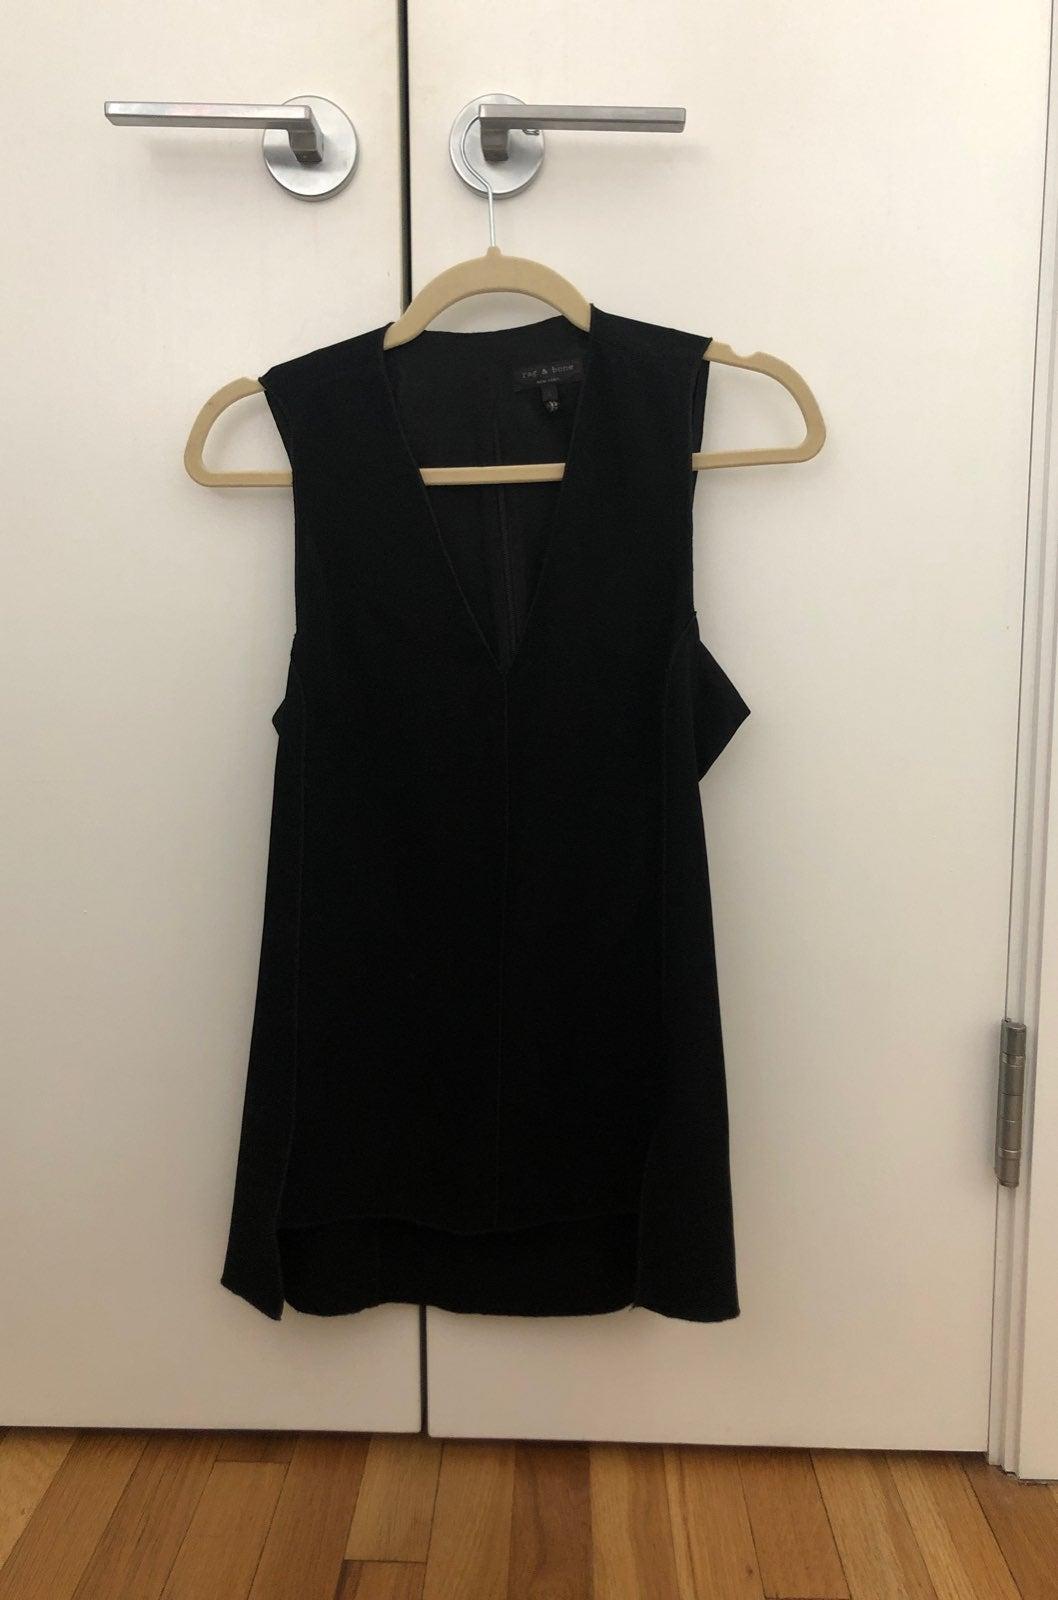 rag & bone - sleeveless top - Small